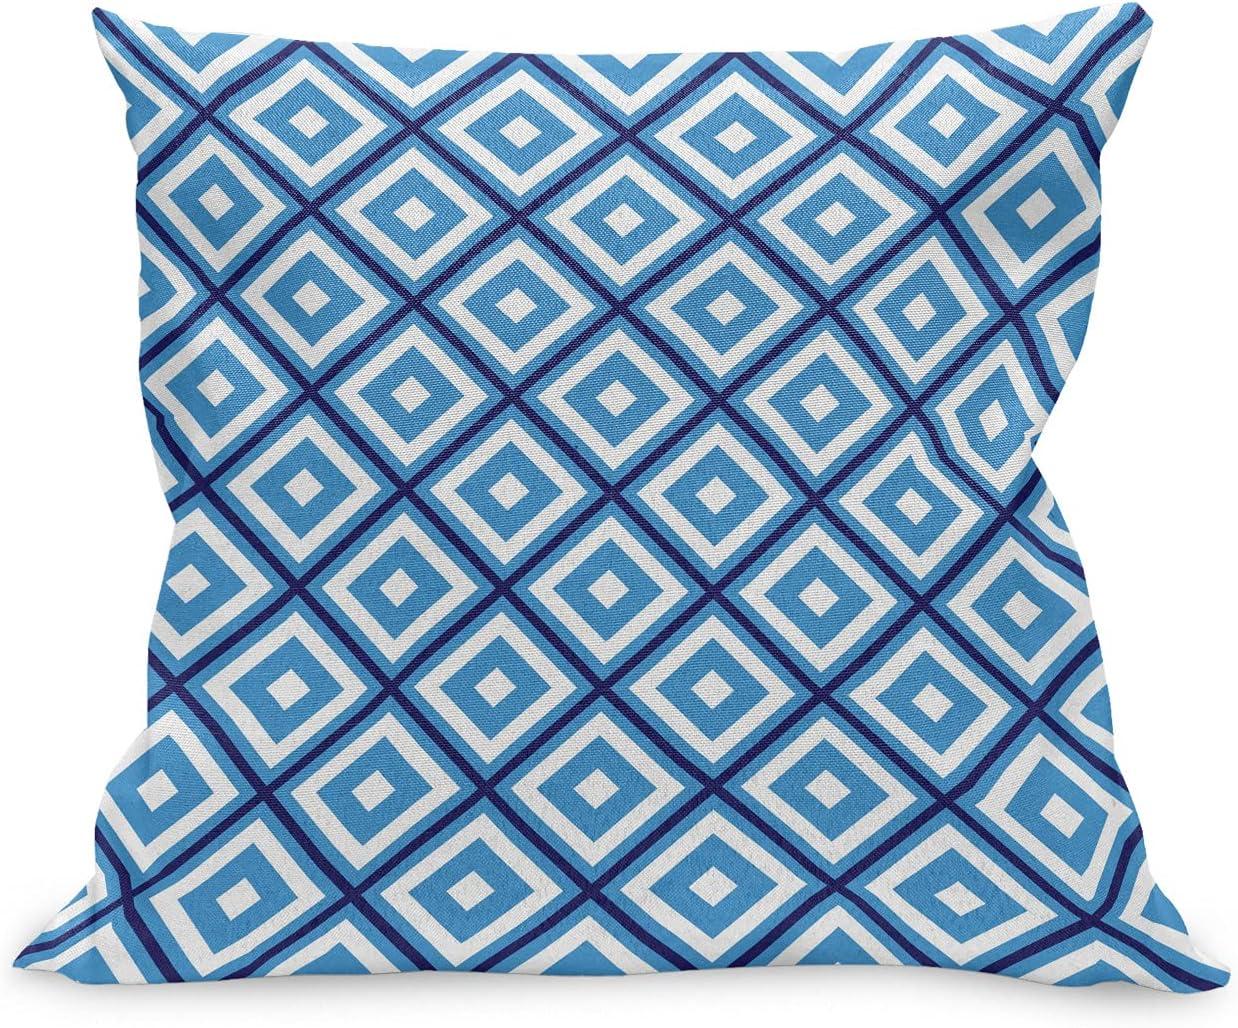 Ambesonne Abstract Throw Pillow Award Cushion Case Diamond Geometric Tulsa Mall